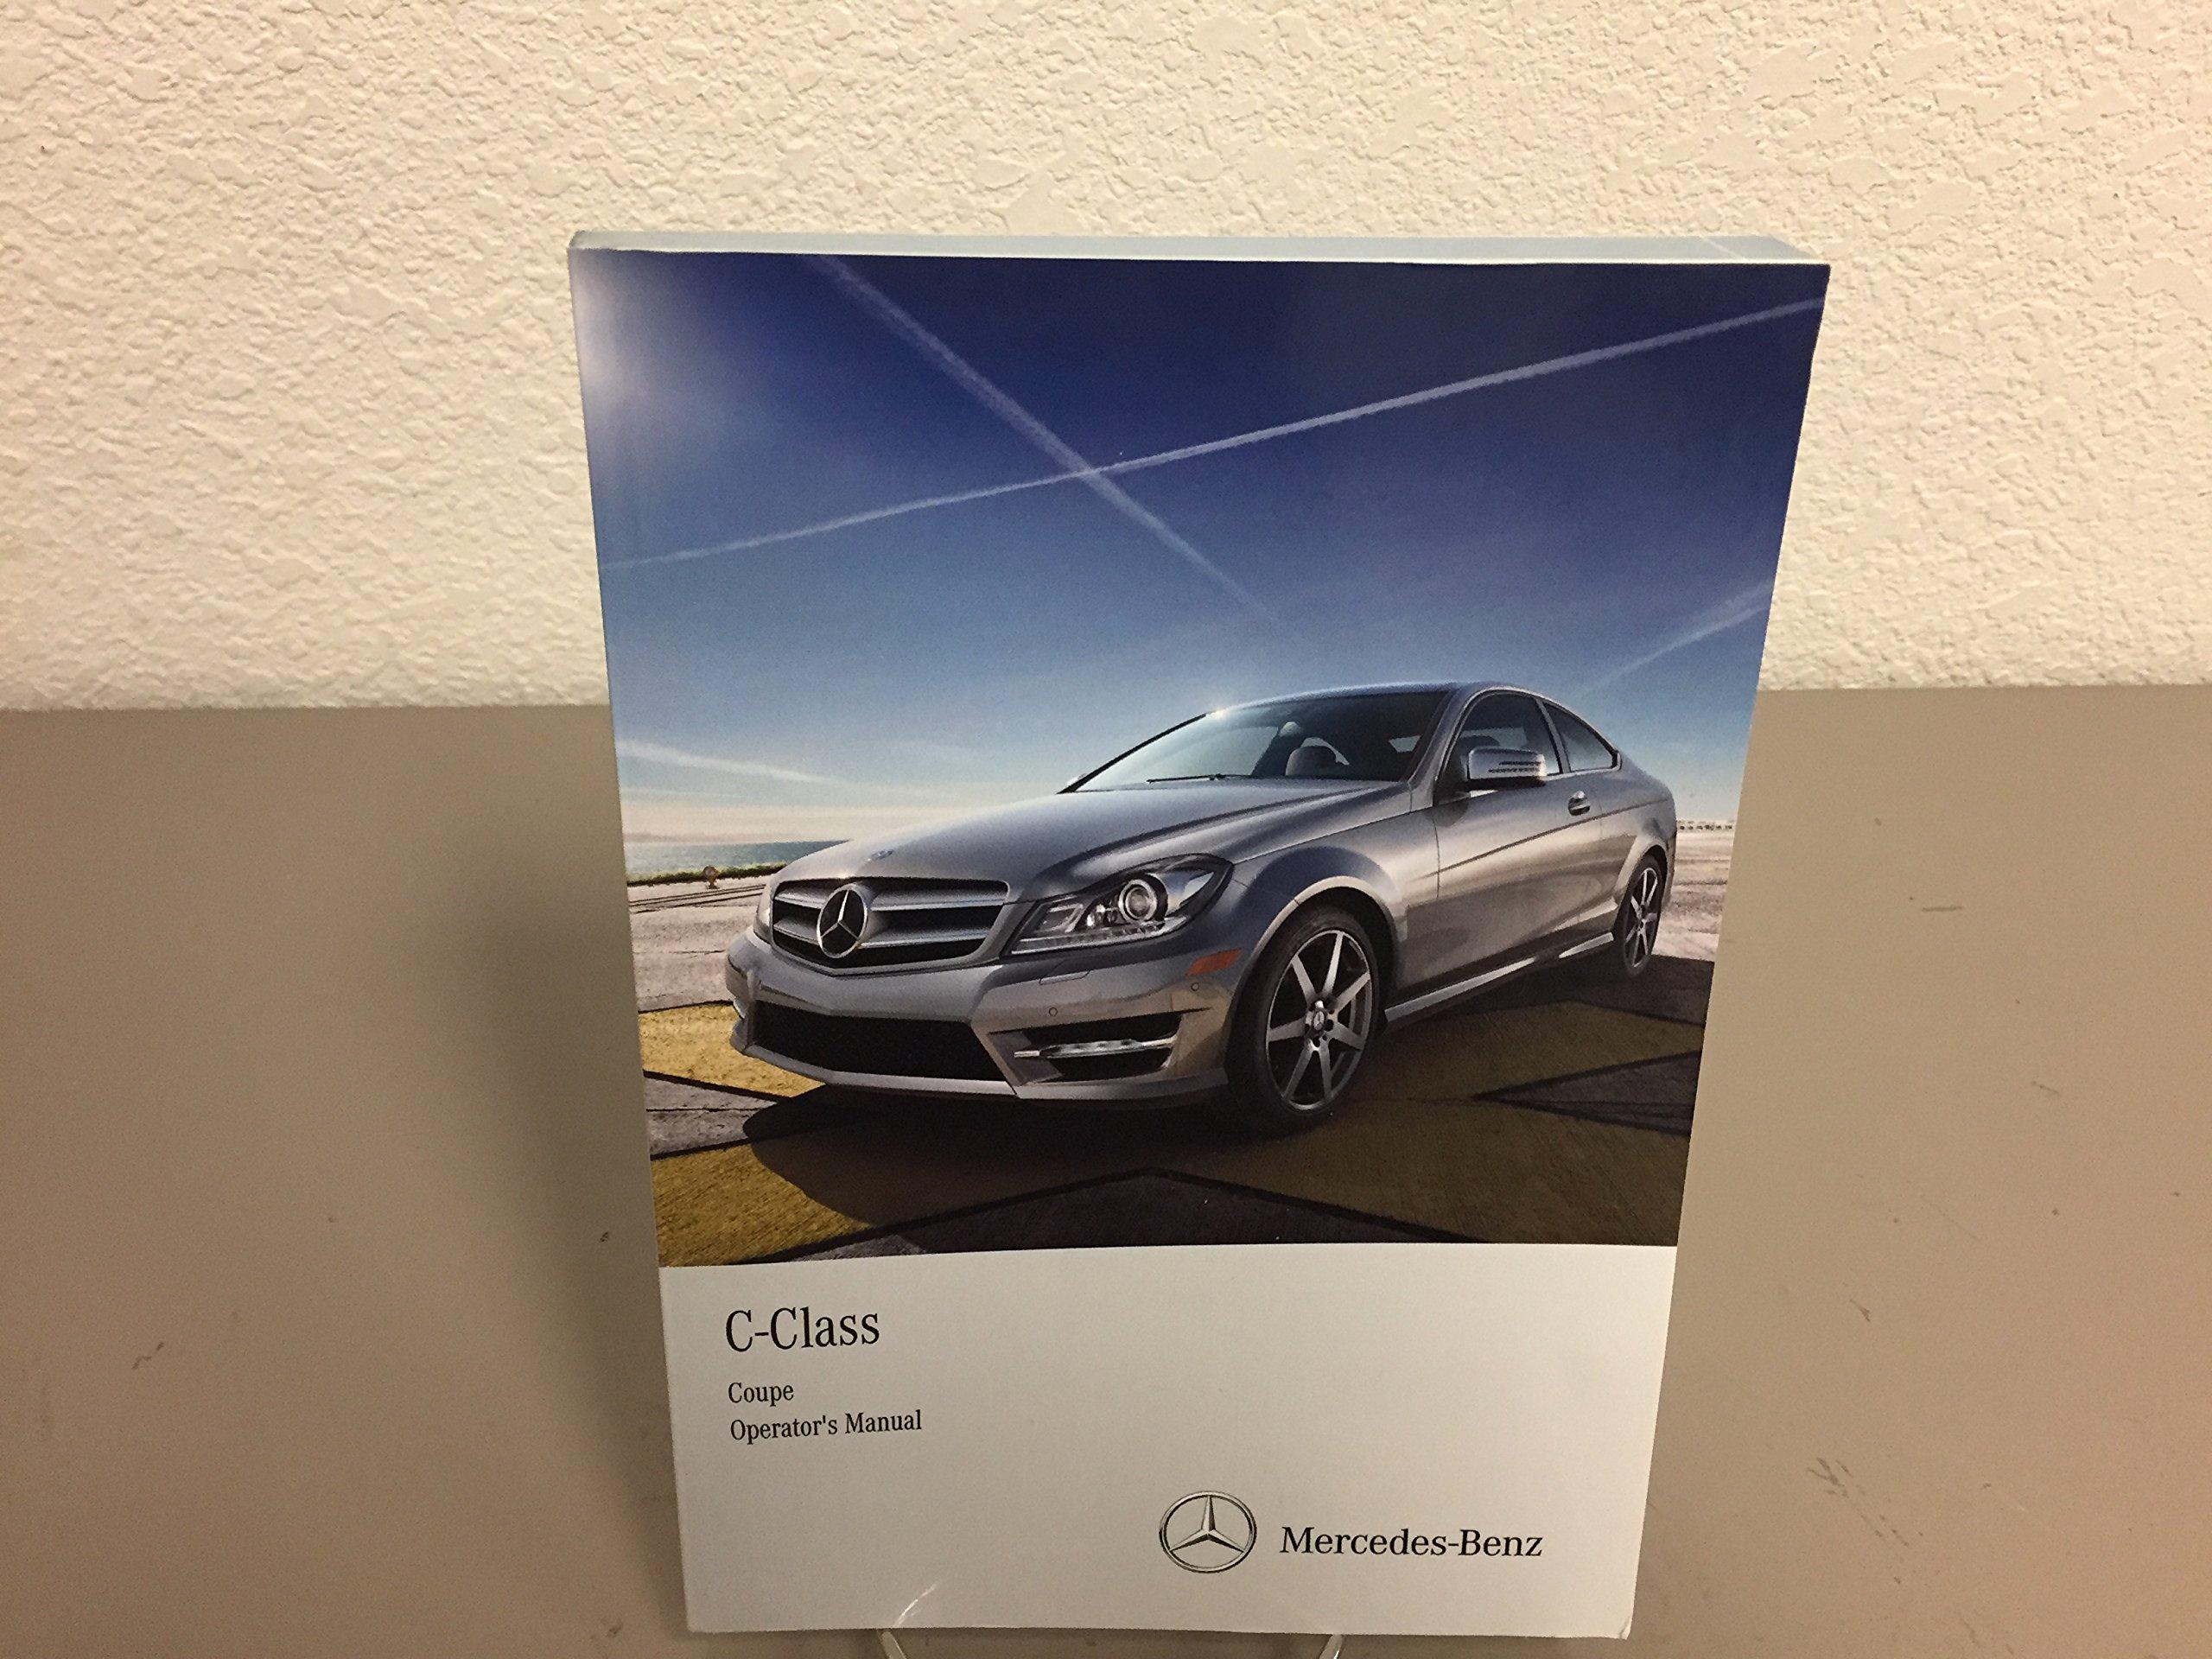 2013 mercedes benz c class coupe owner s manual for all c250 c300 rh amazon com mercedes benz linguatronic manual 2009 Mercedes E350 Manual